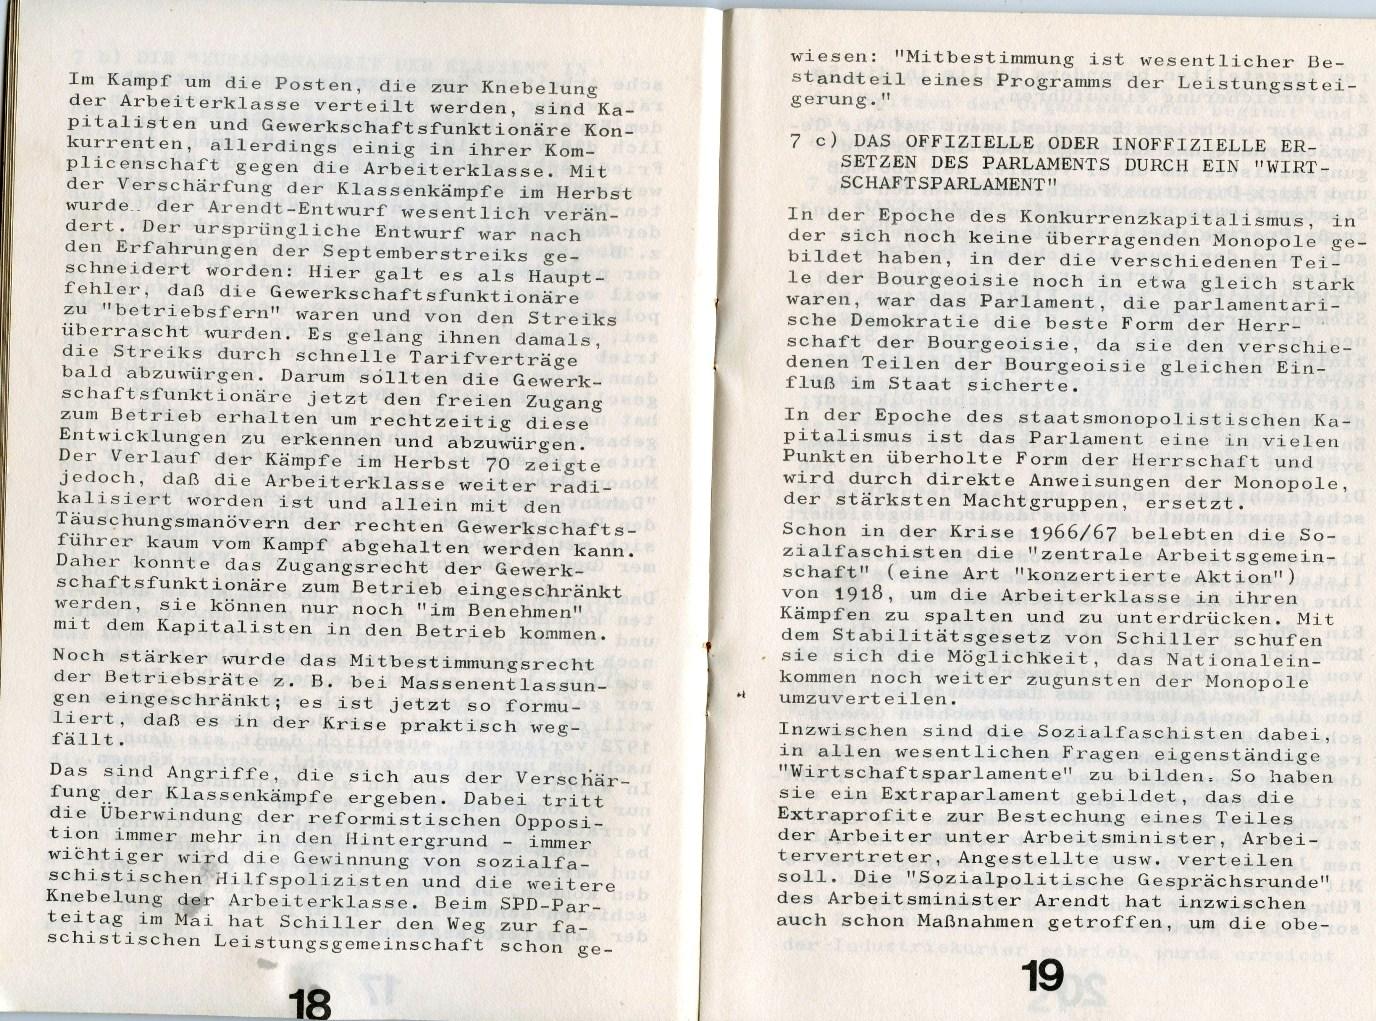 KJVD_Sozialdemokratie_Sozialfaschismus_1971_11